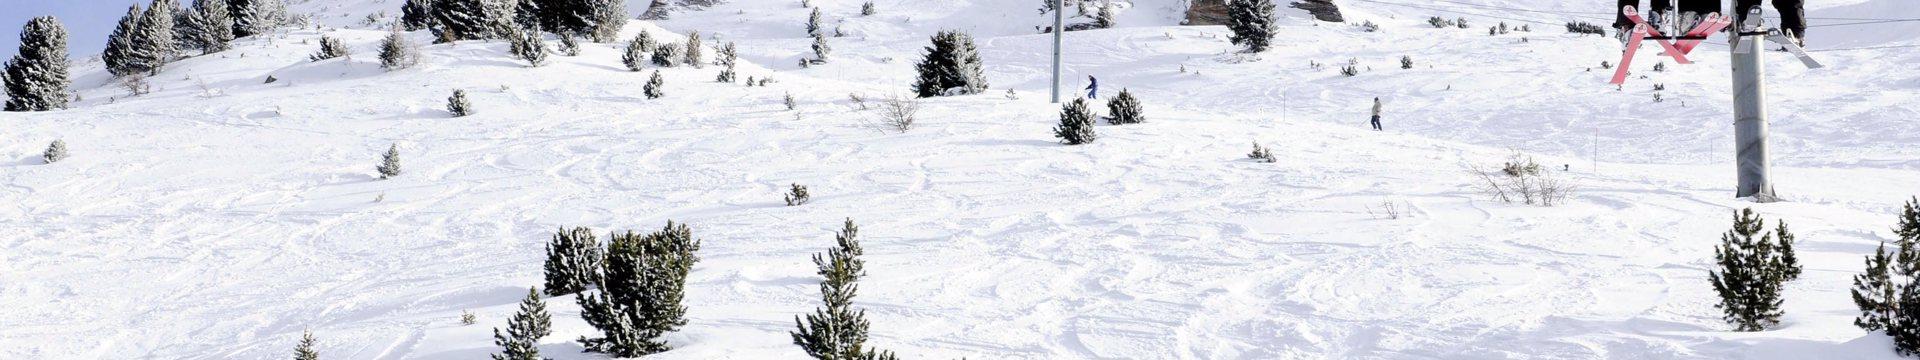 Skigebied La Norma